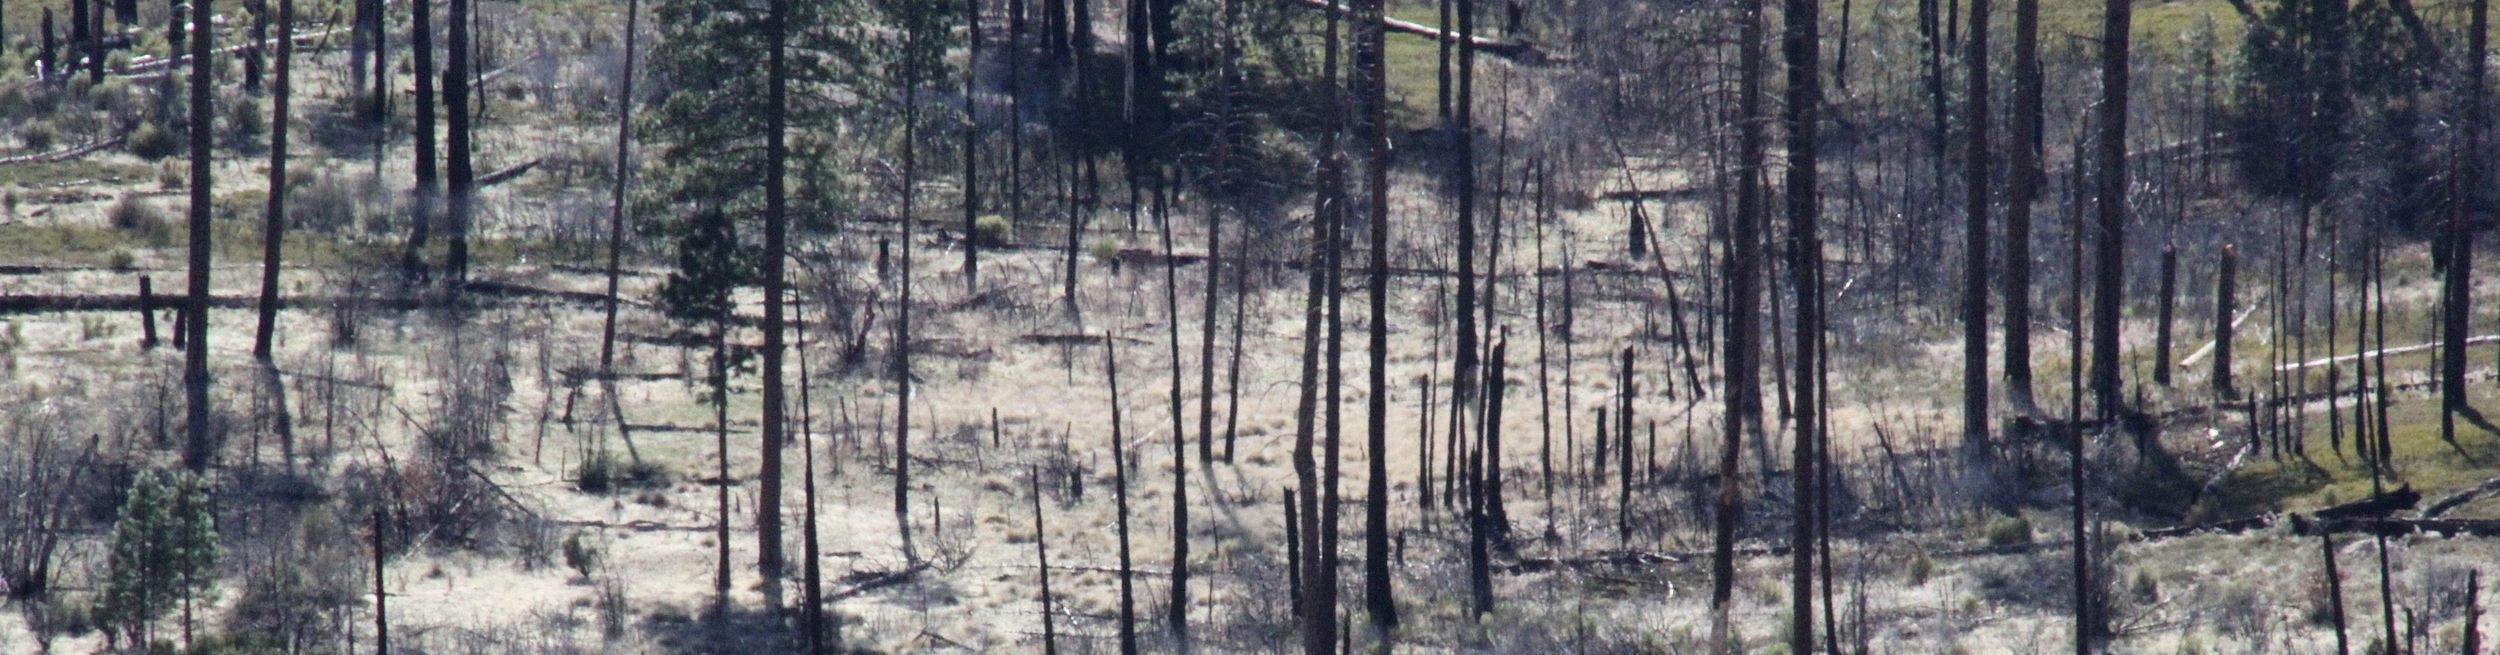 burnt_field.jpg